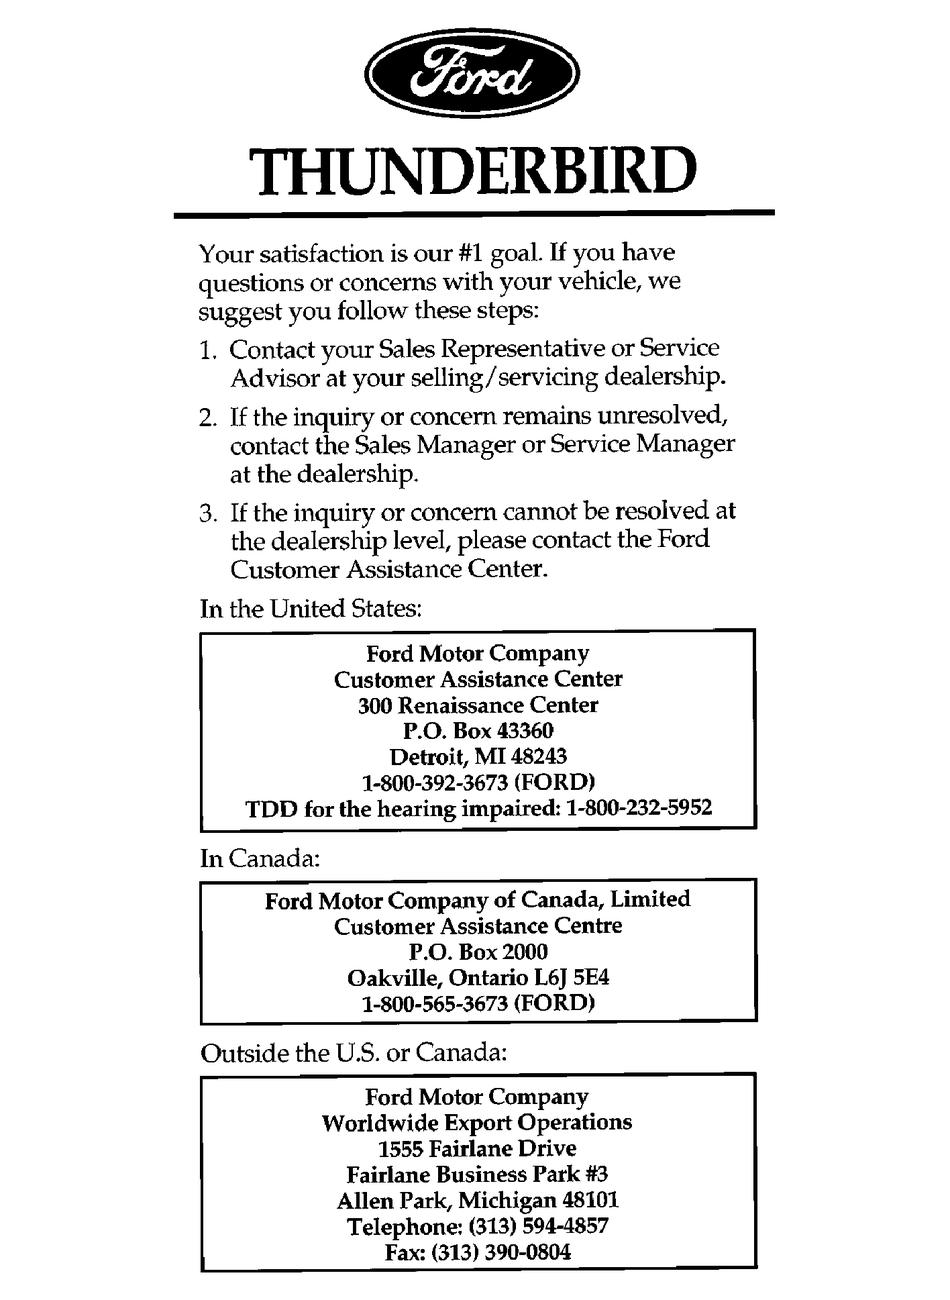 Ford Thunderbird Owner S Manual Pdf Download Manualslib